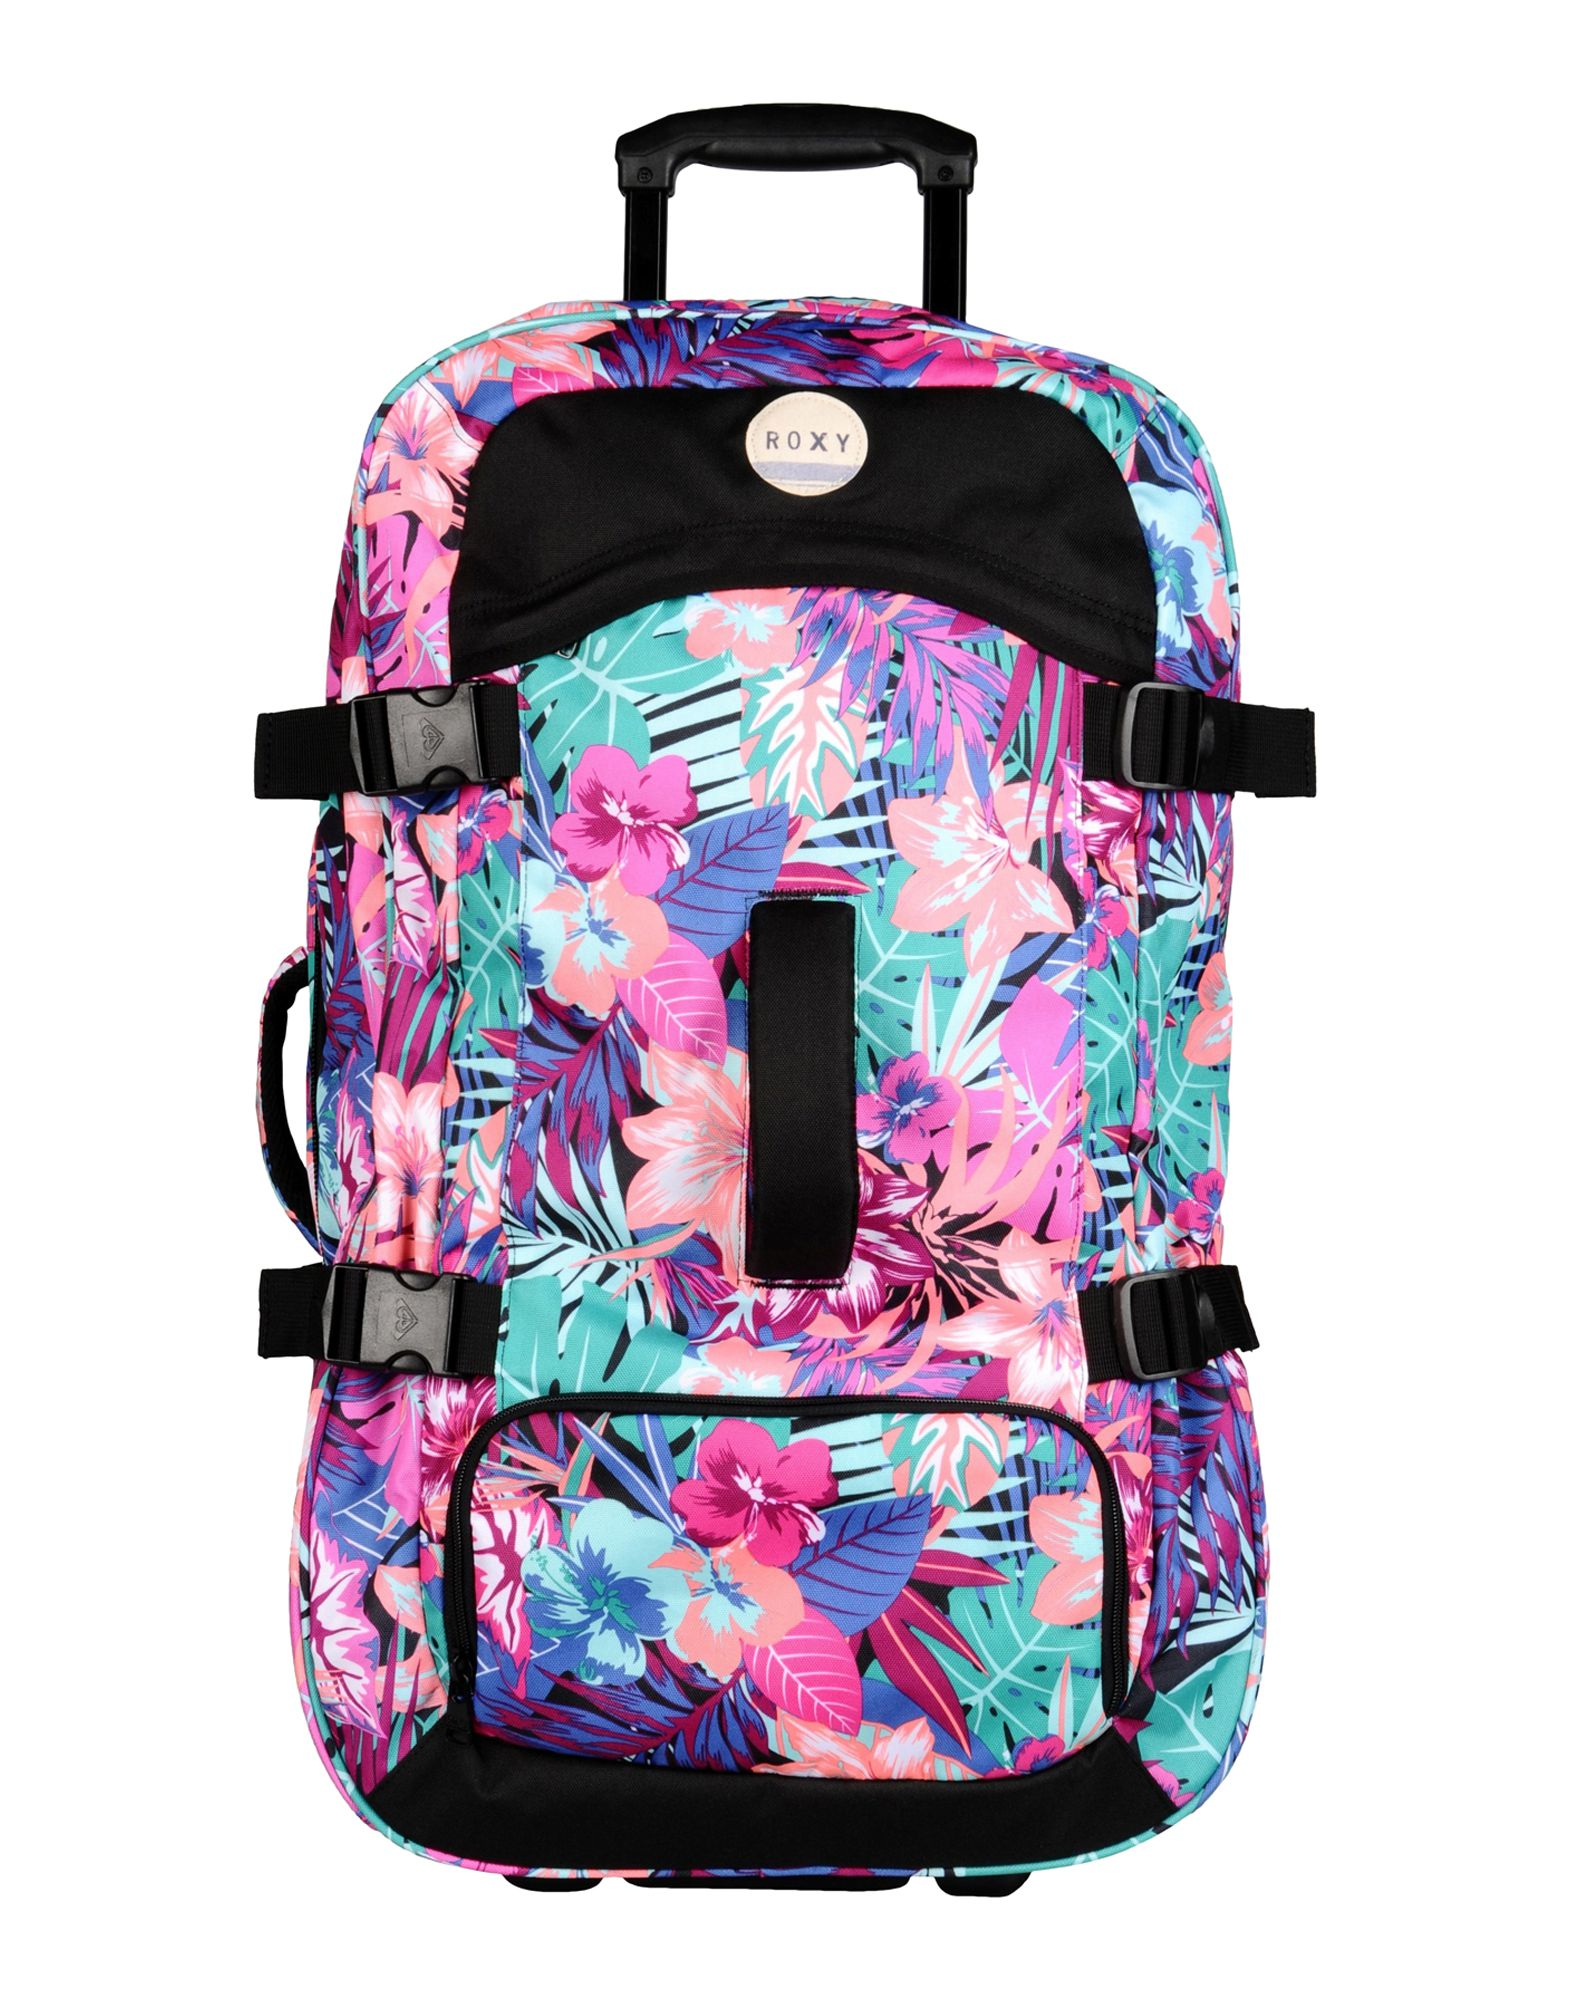 Waterproof Duffle Bags >> Lyst - Roxy Wheeled Luggage in Pink